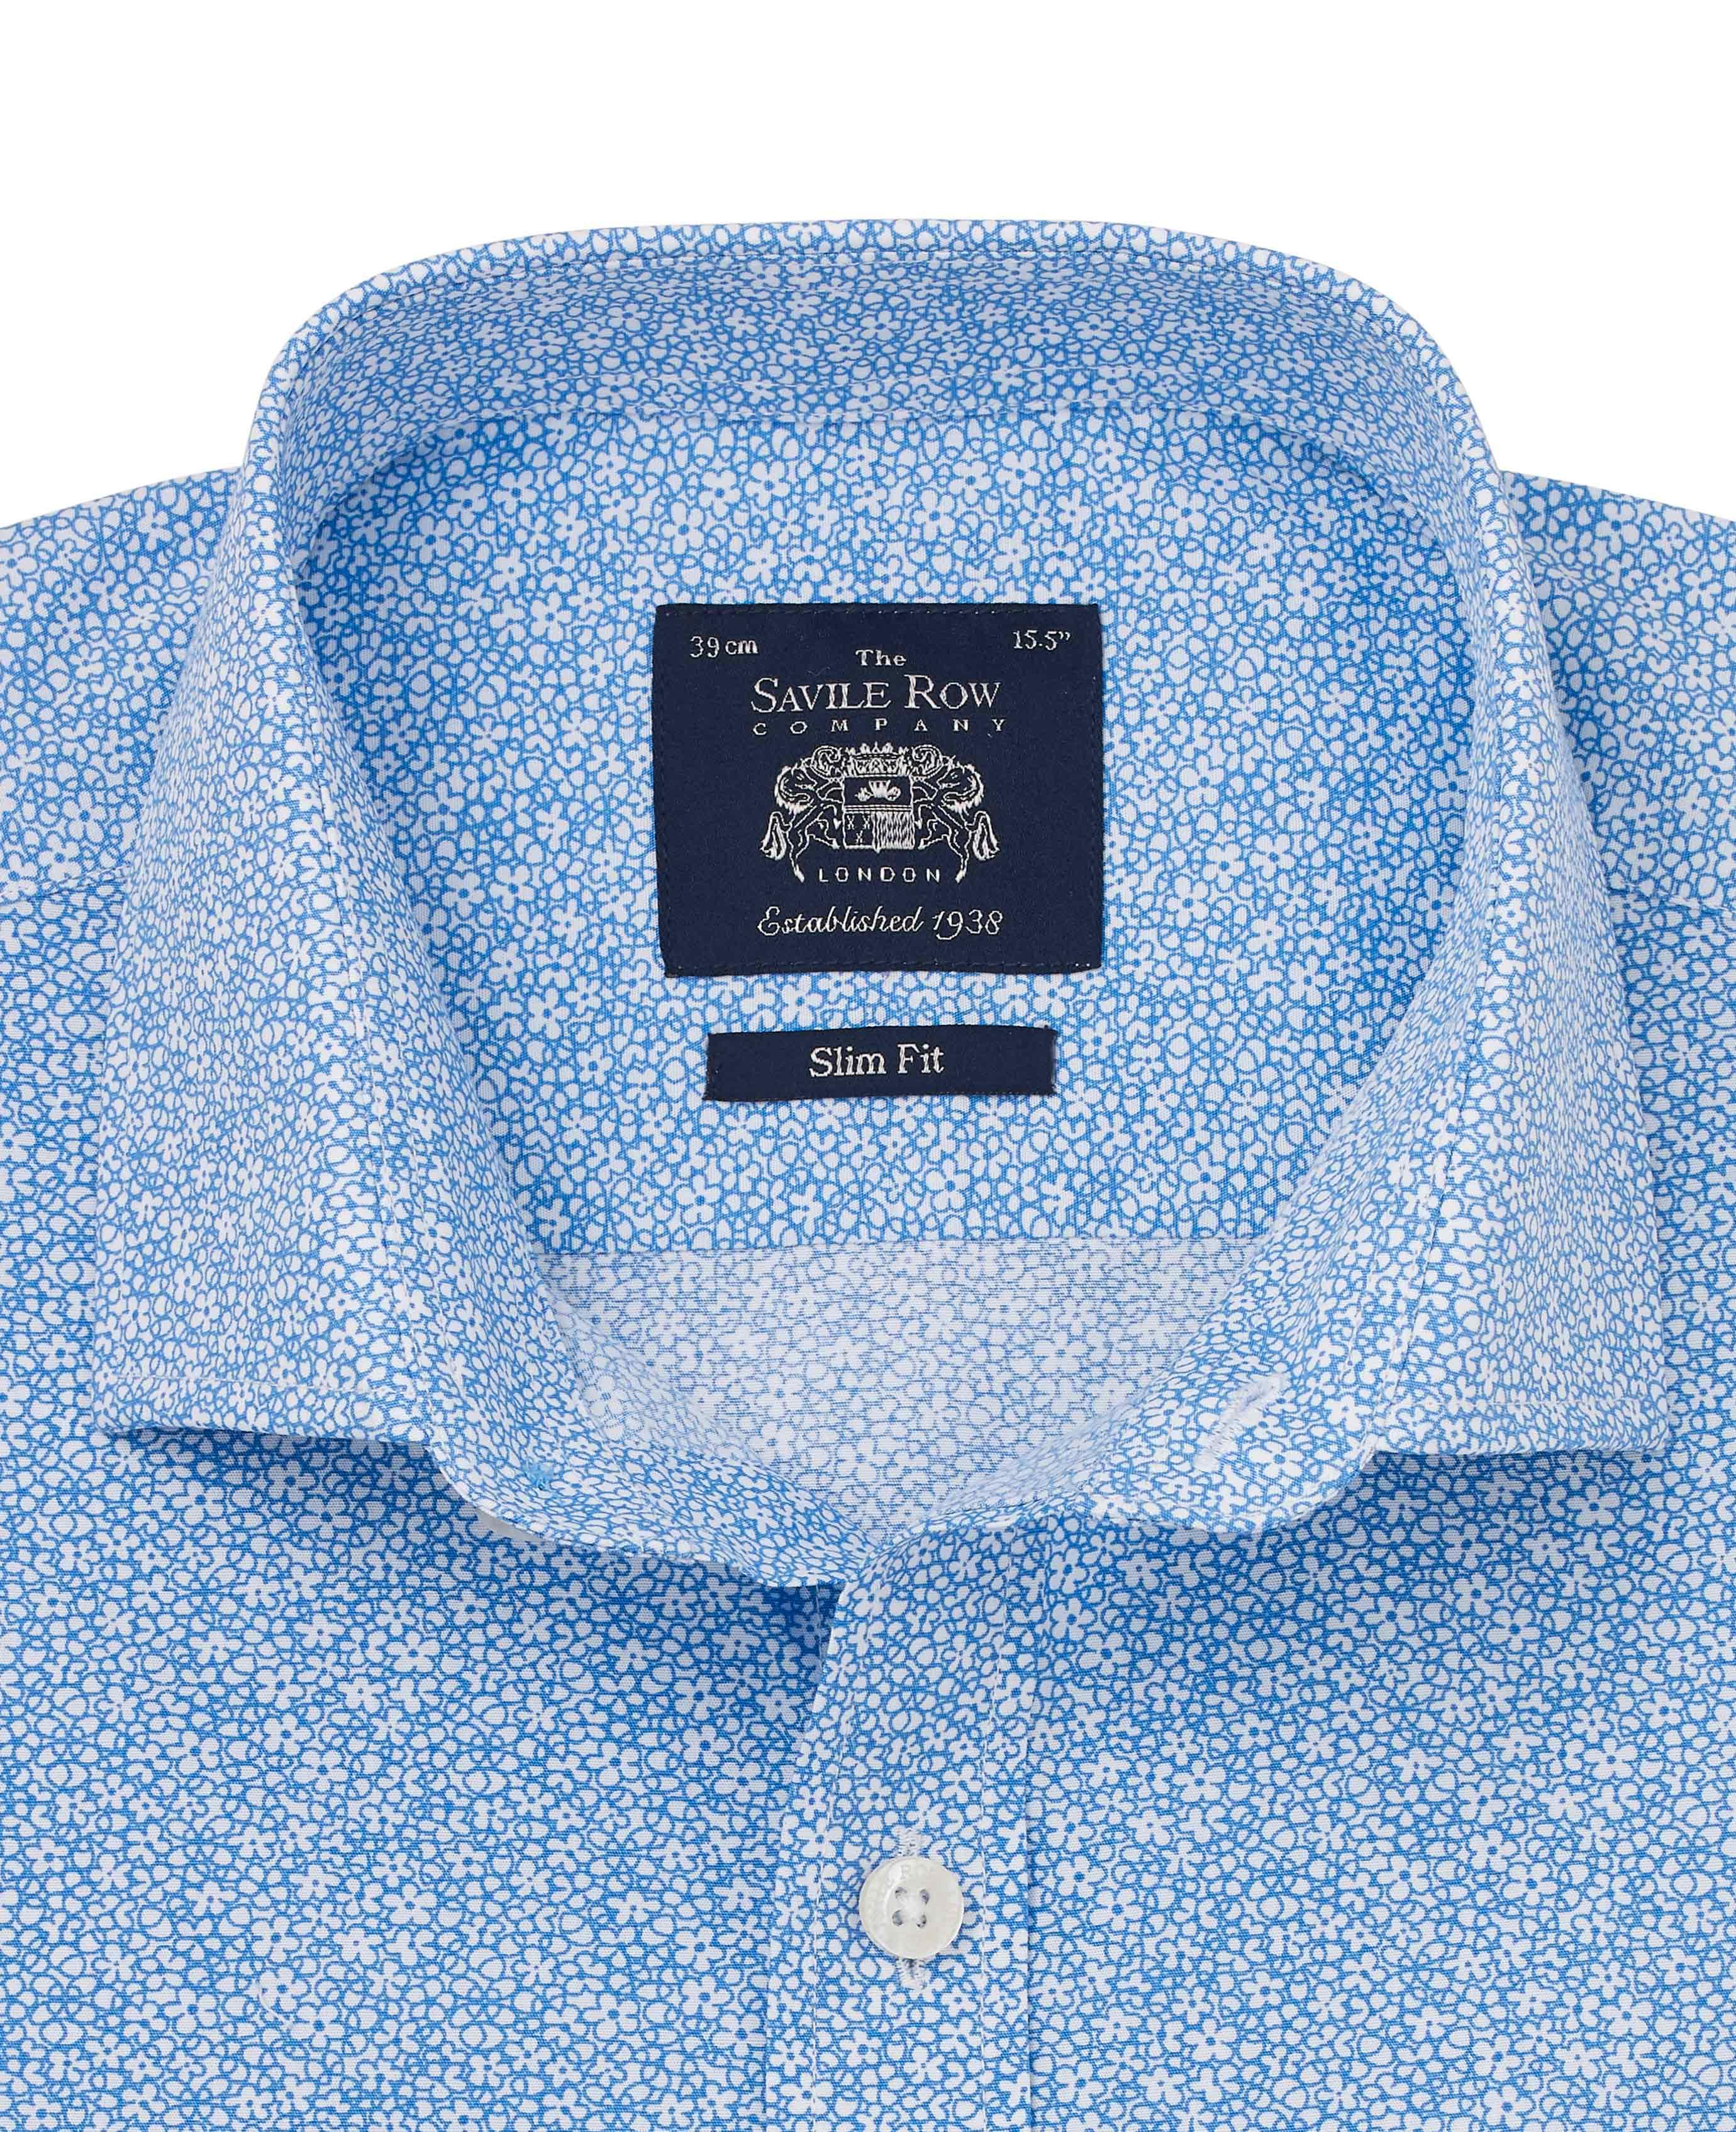 Savile-Row-Men-039-s-White-Blue-Floral-Print-Slim-Fit-Shirt-Single-Cuff thumbnail 3